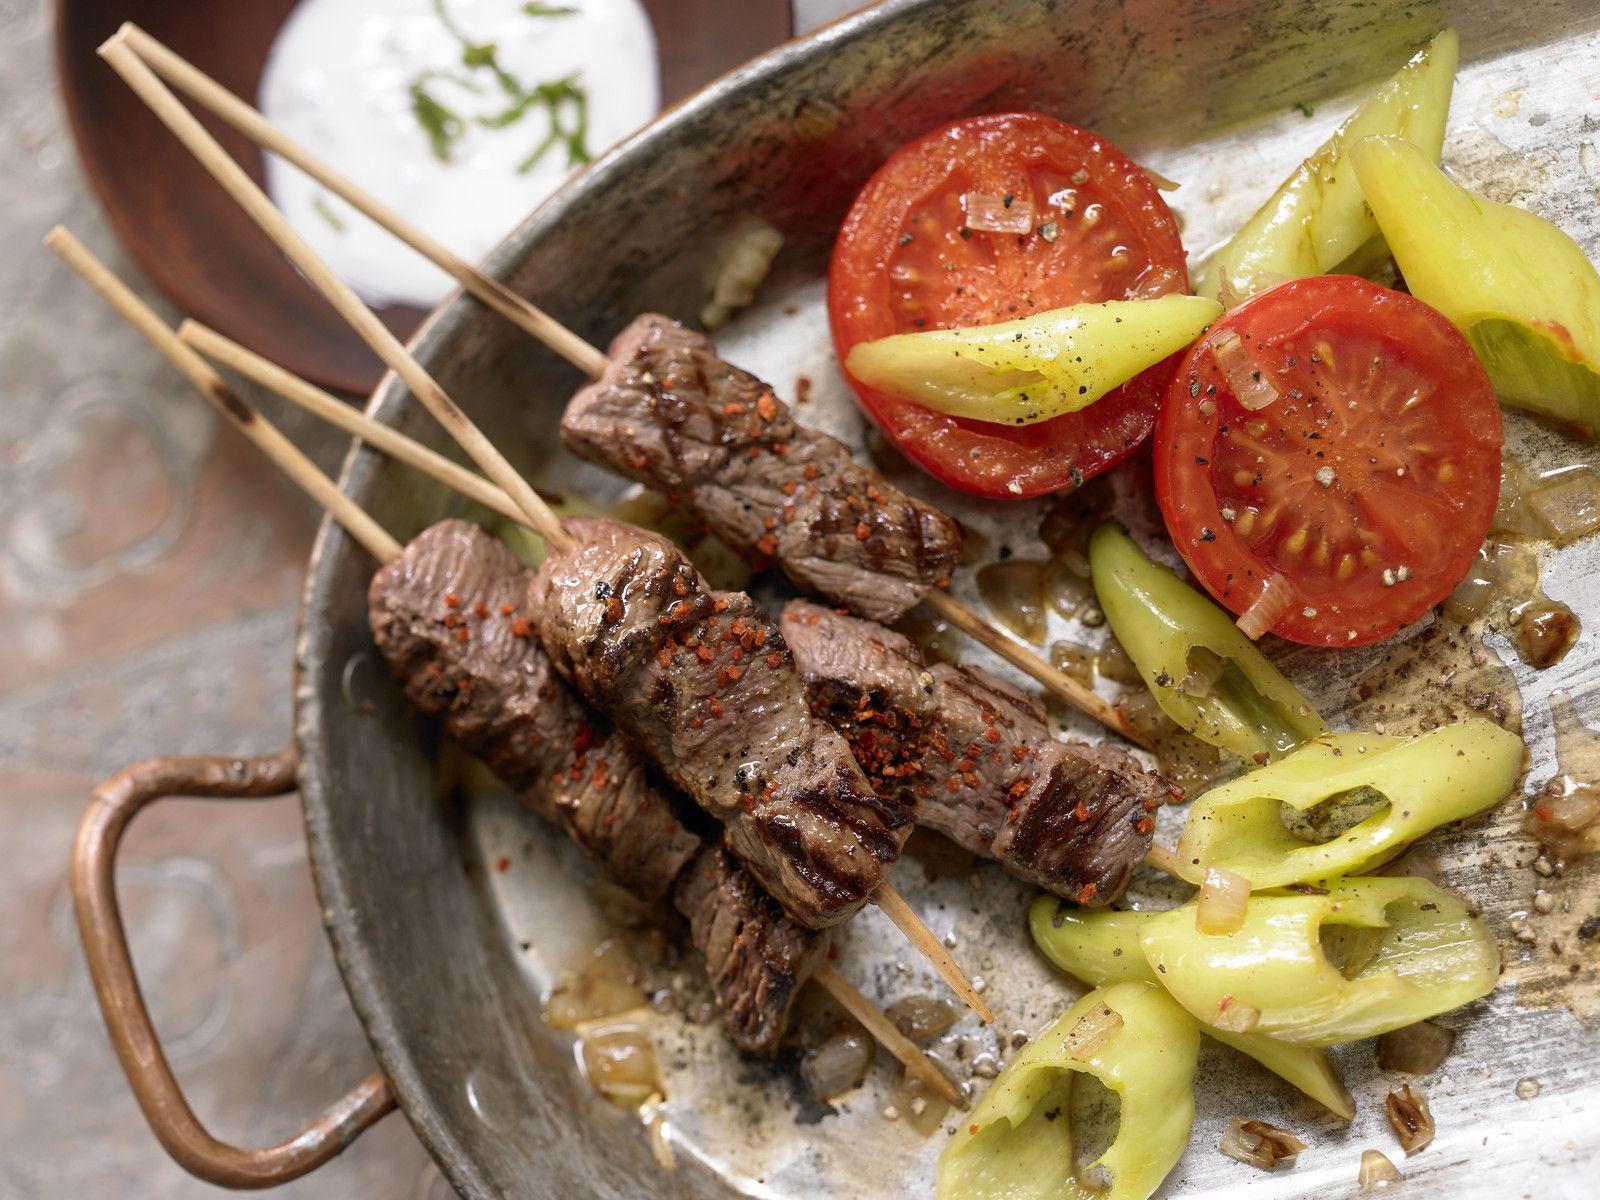 Turkish Beef Skewers Recipe Eat Smarter Usa Images, Photos, Reviews